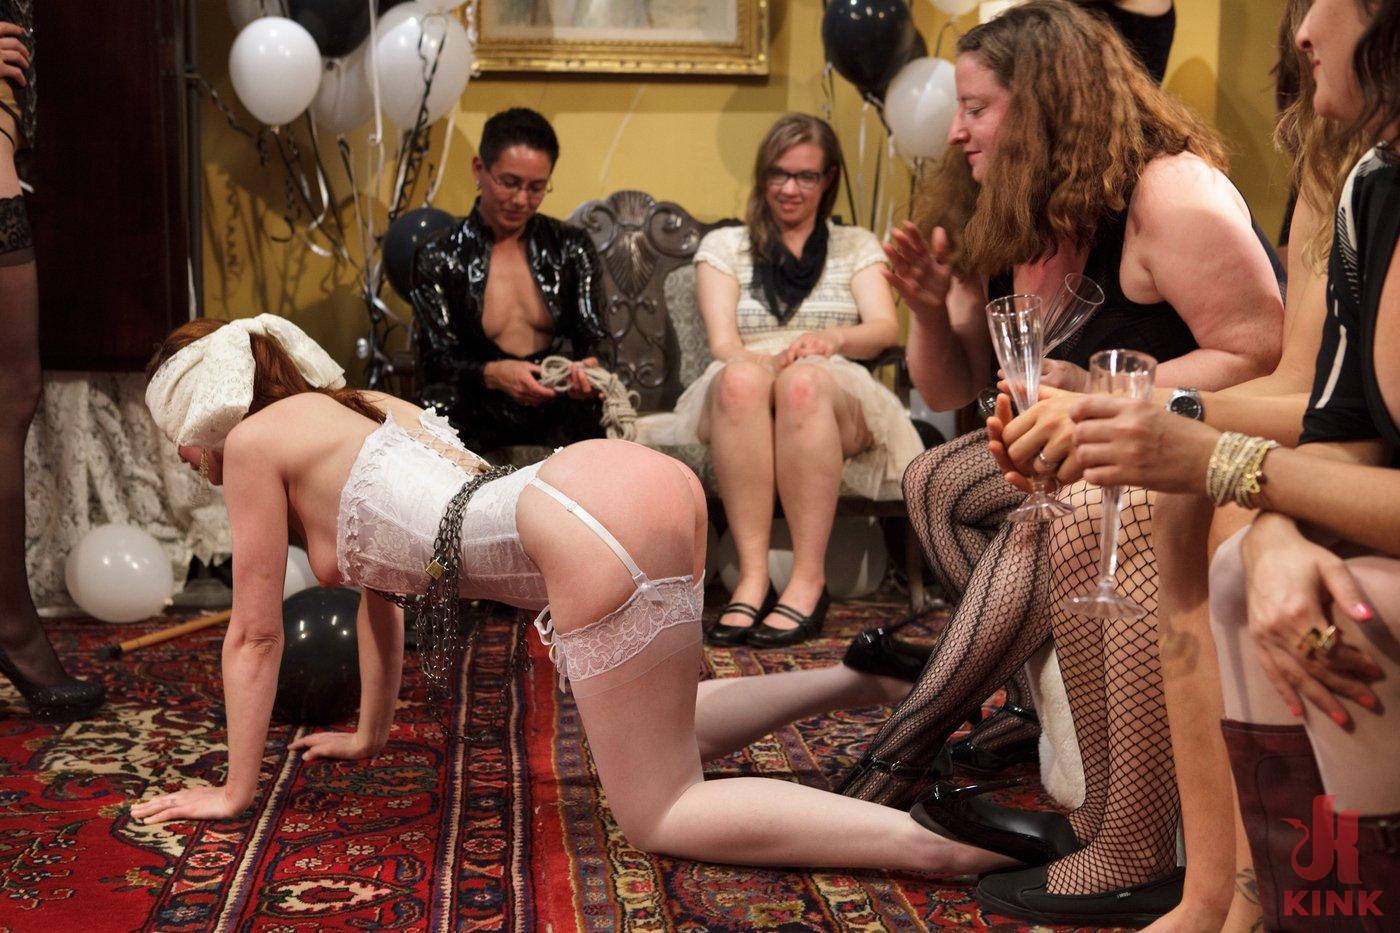 public sex show bdsm master